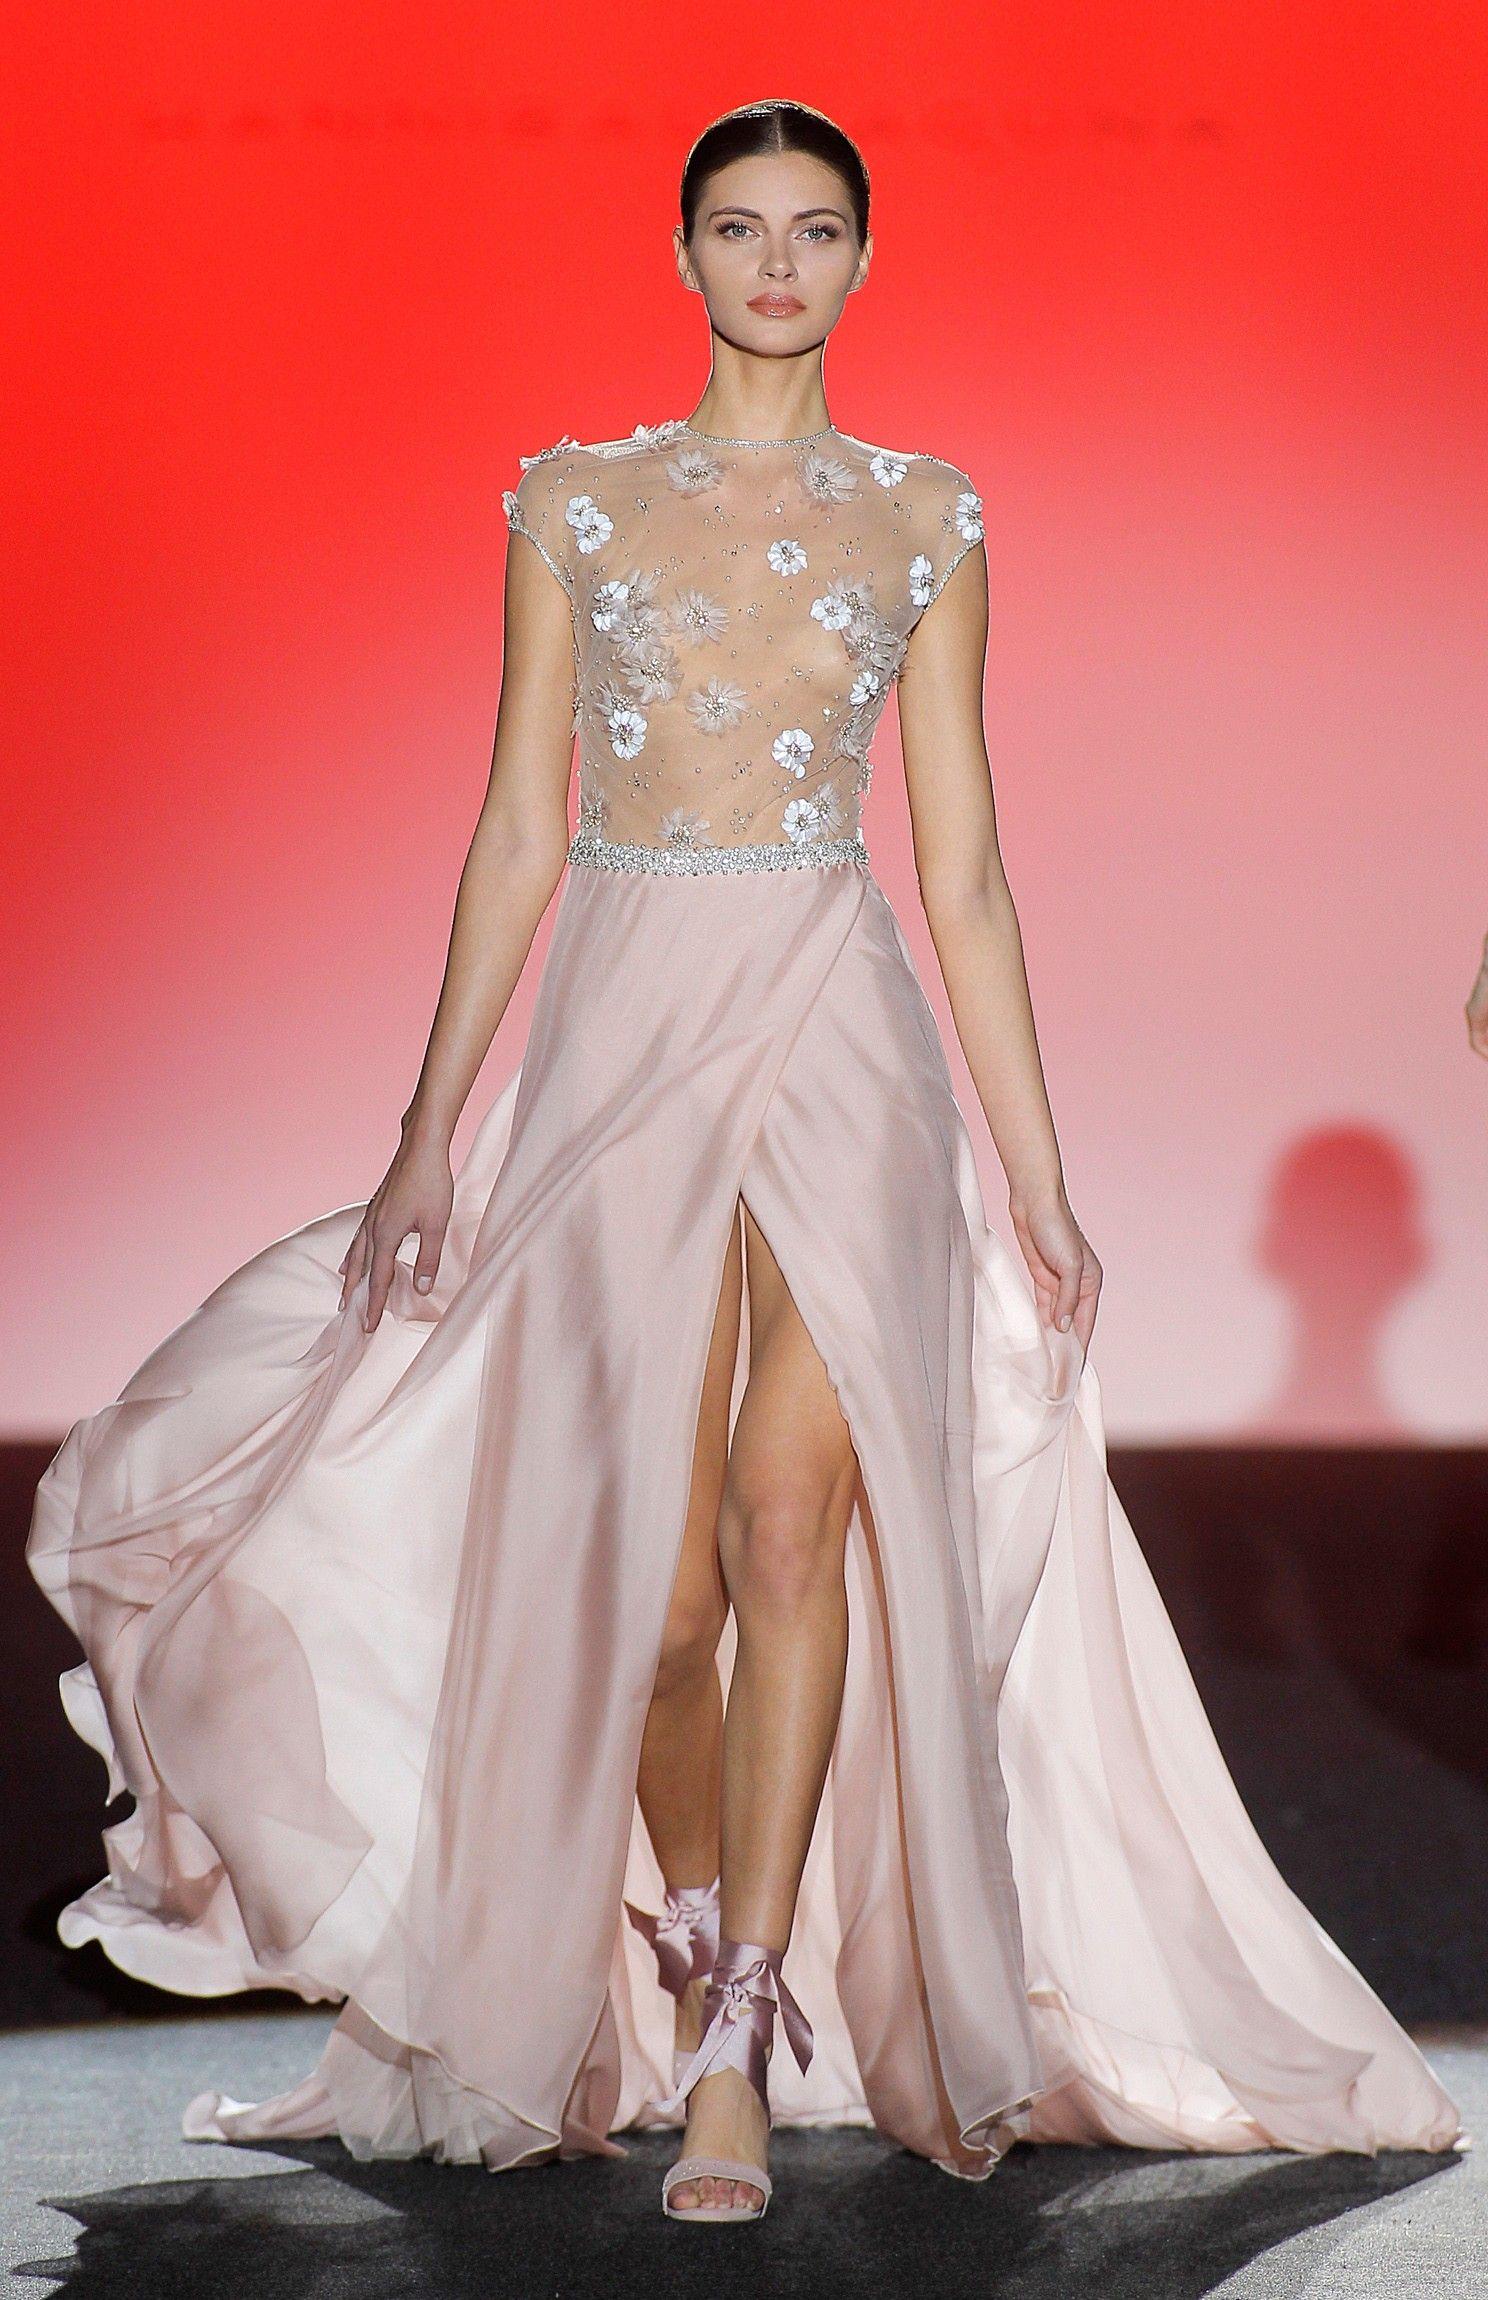 Otoño - Invierno 2017 - 2018 - Couture HAnnibal Laguna | Vestidos ...